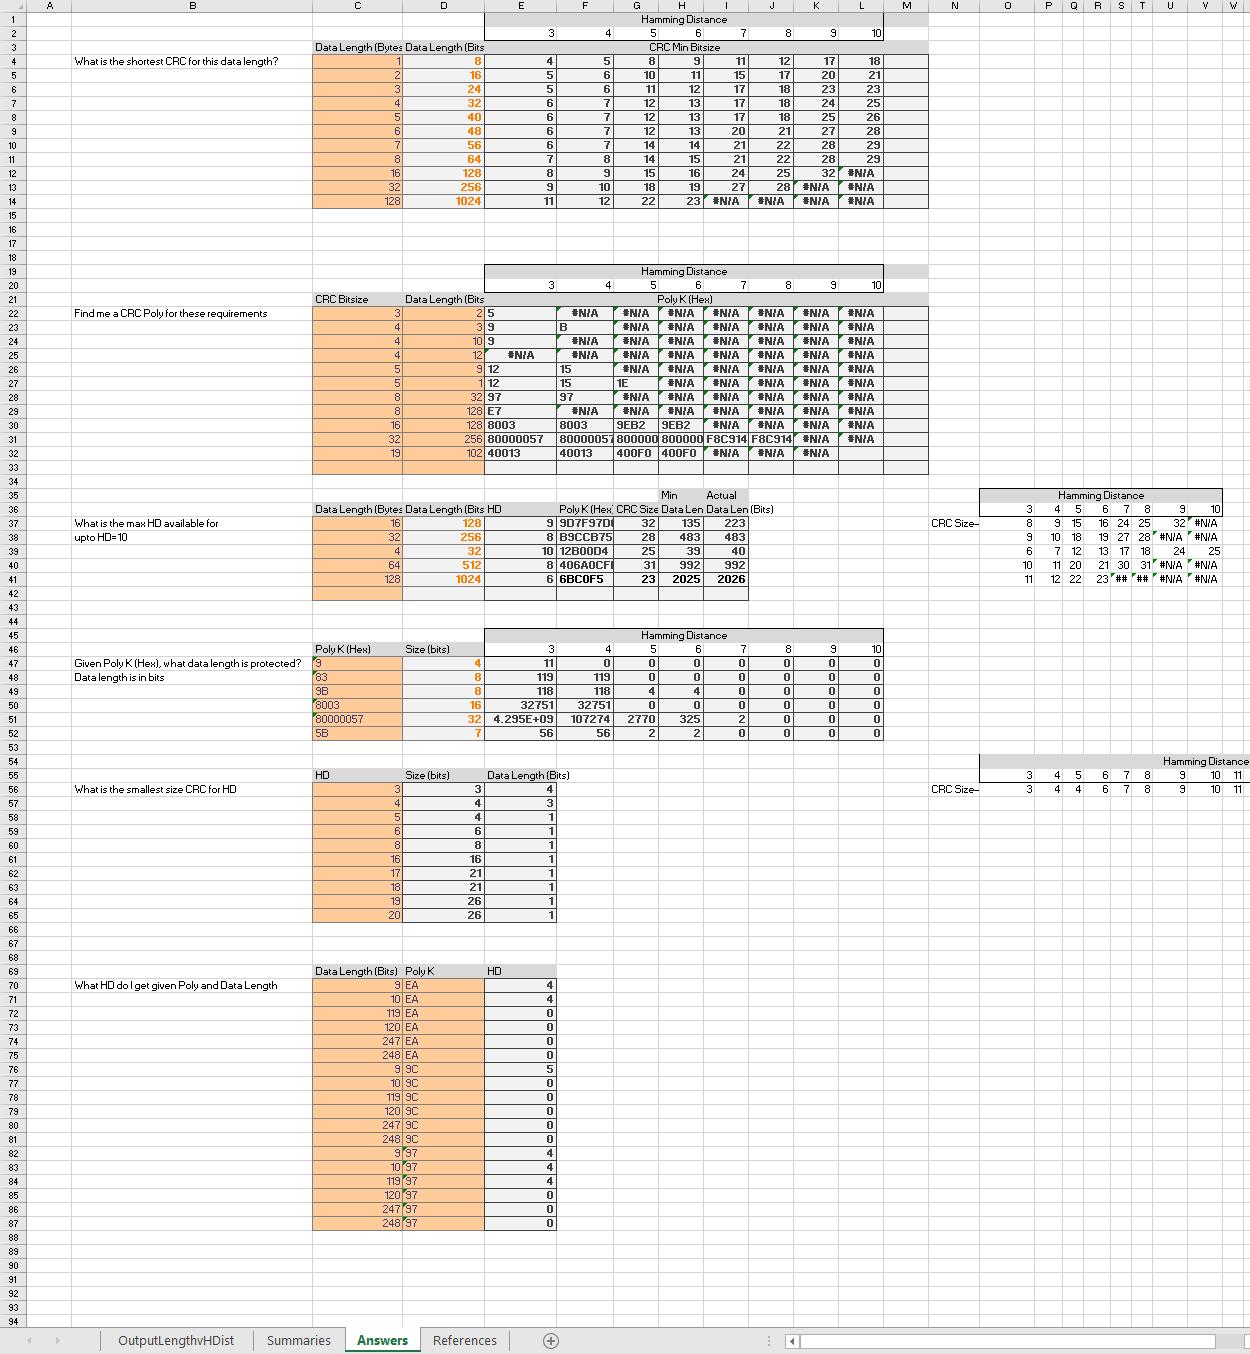 CRC Comparison - Answers sheet